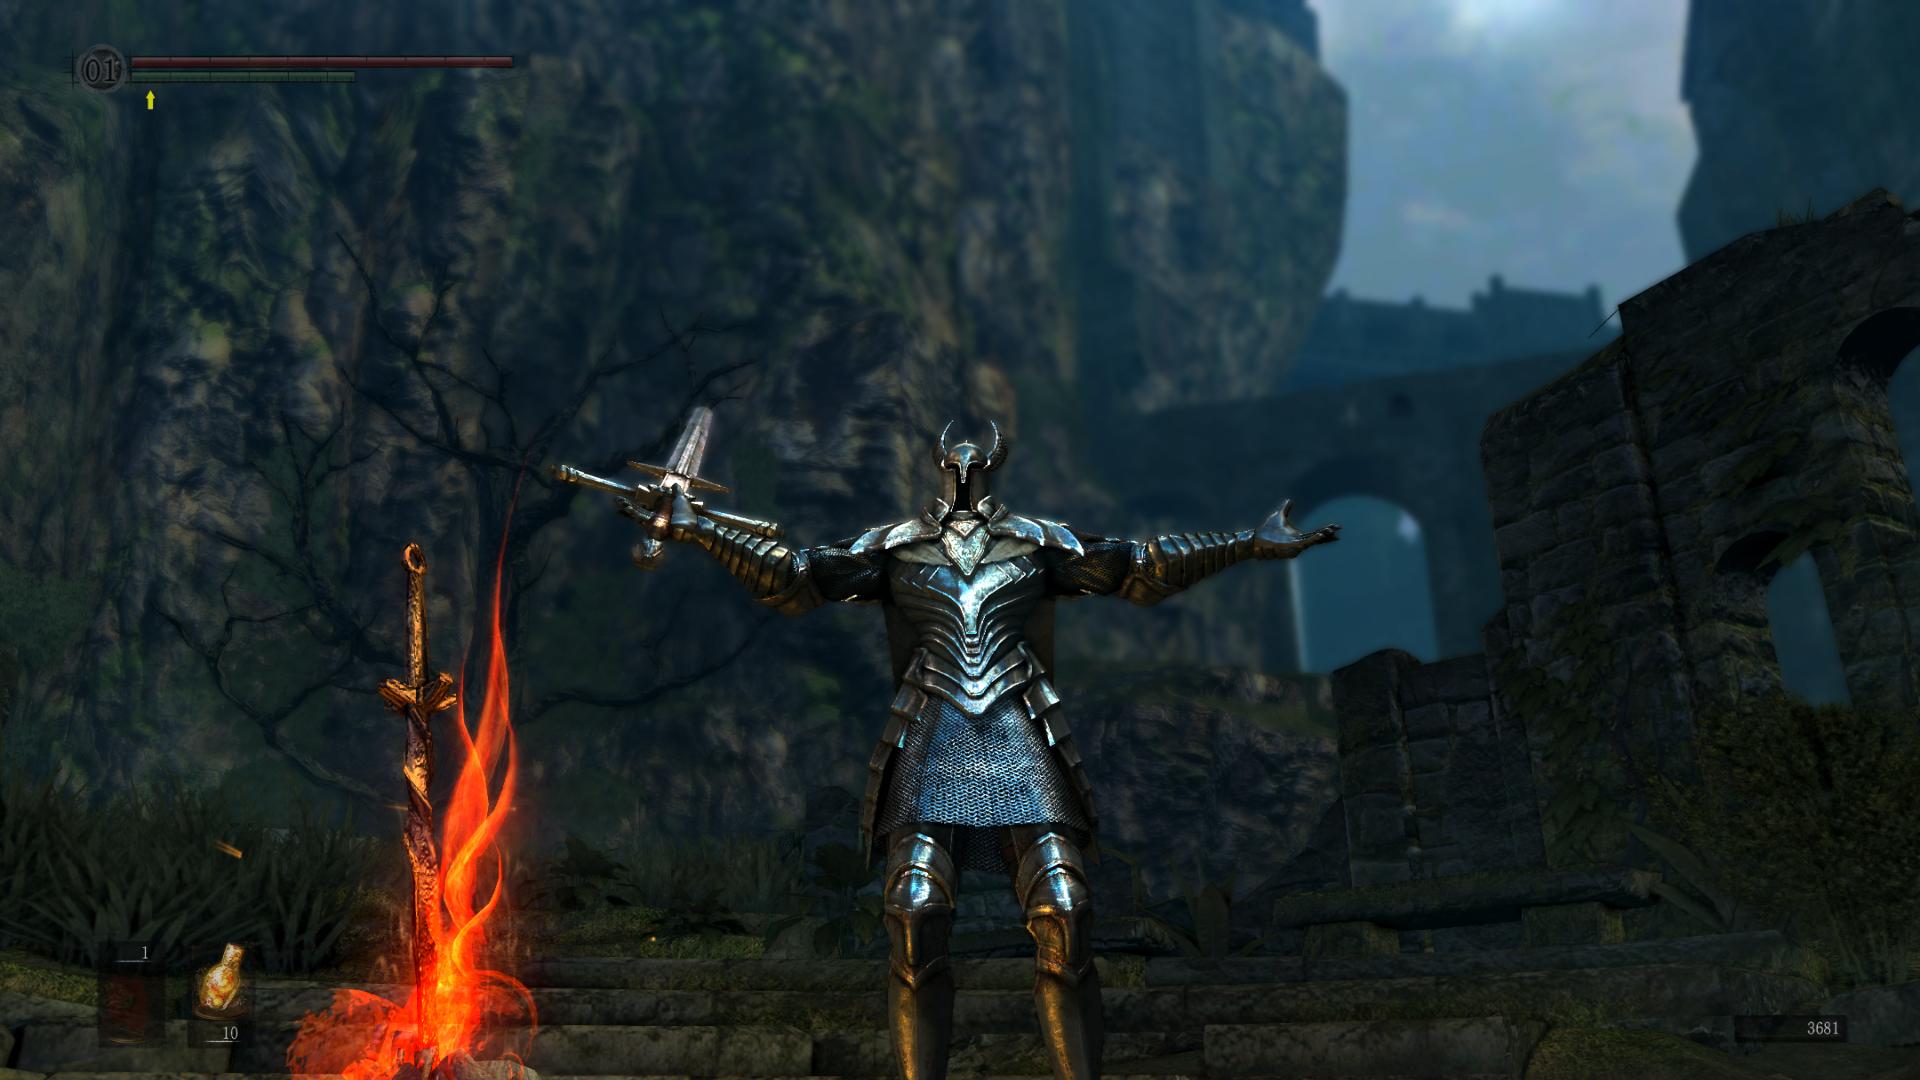 Dark Souls HD Wallpaper | Background Image | 1920x1080 ...